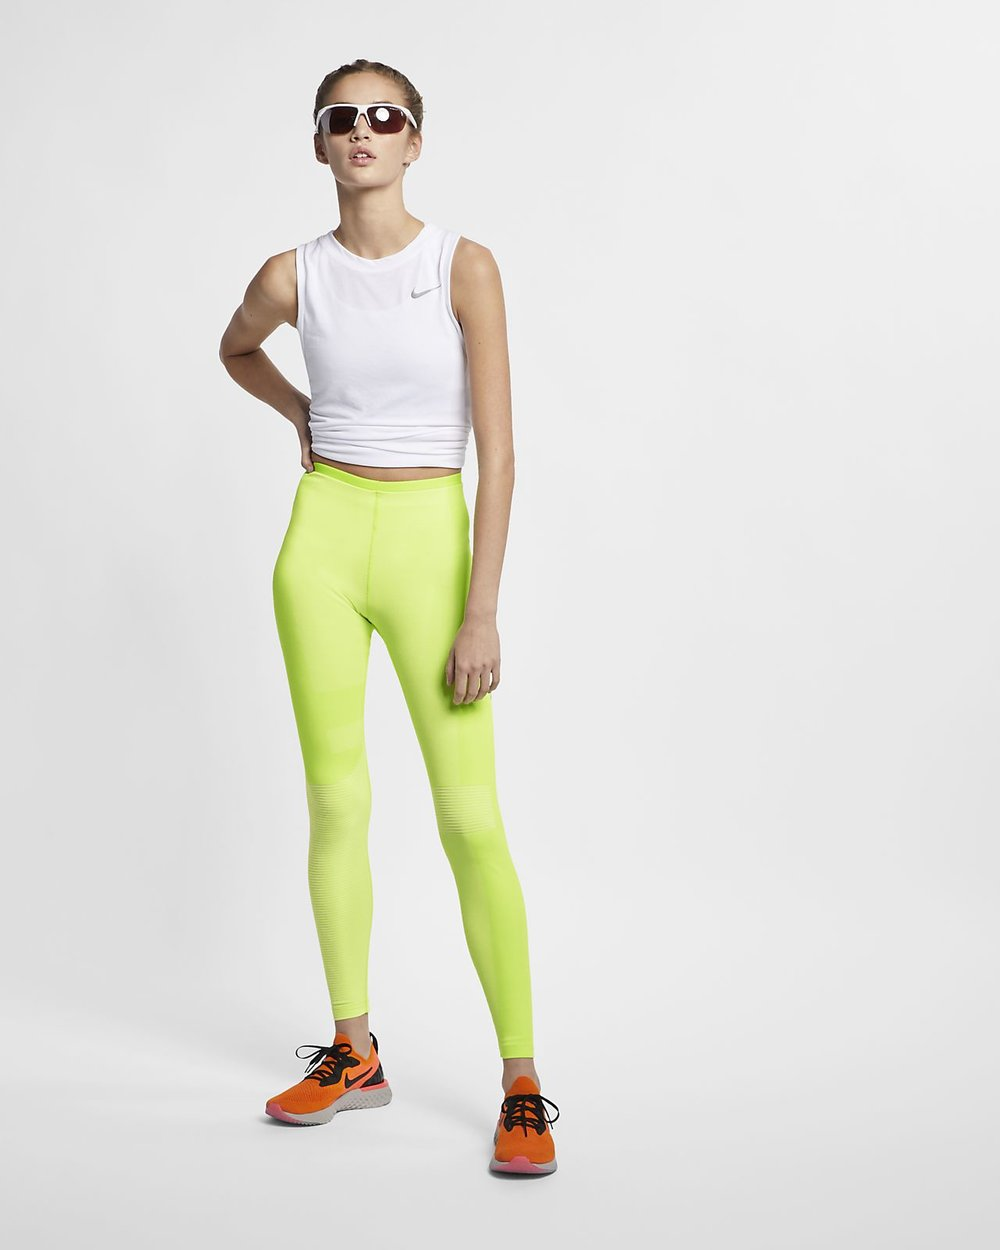 ELLE Women in socitey trang phục thể thao nike 10